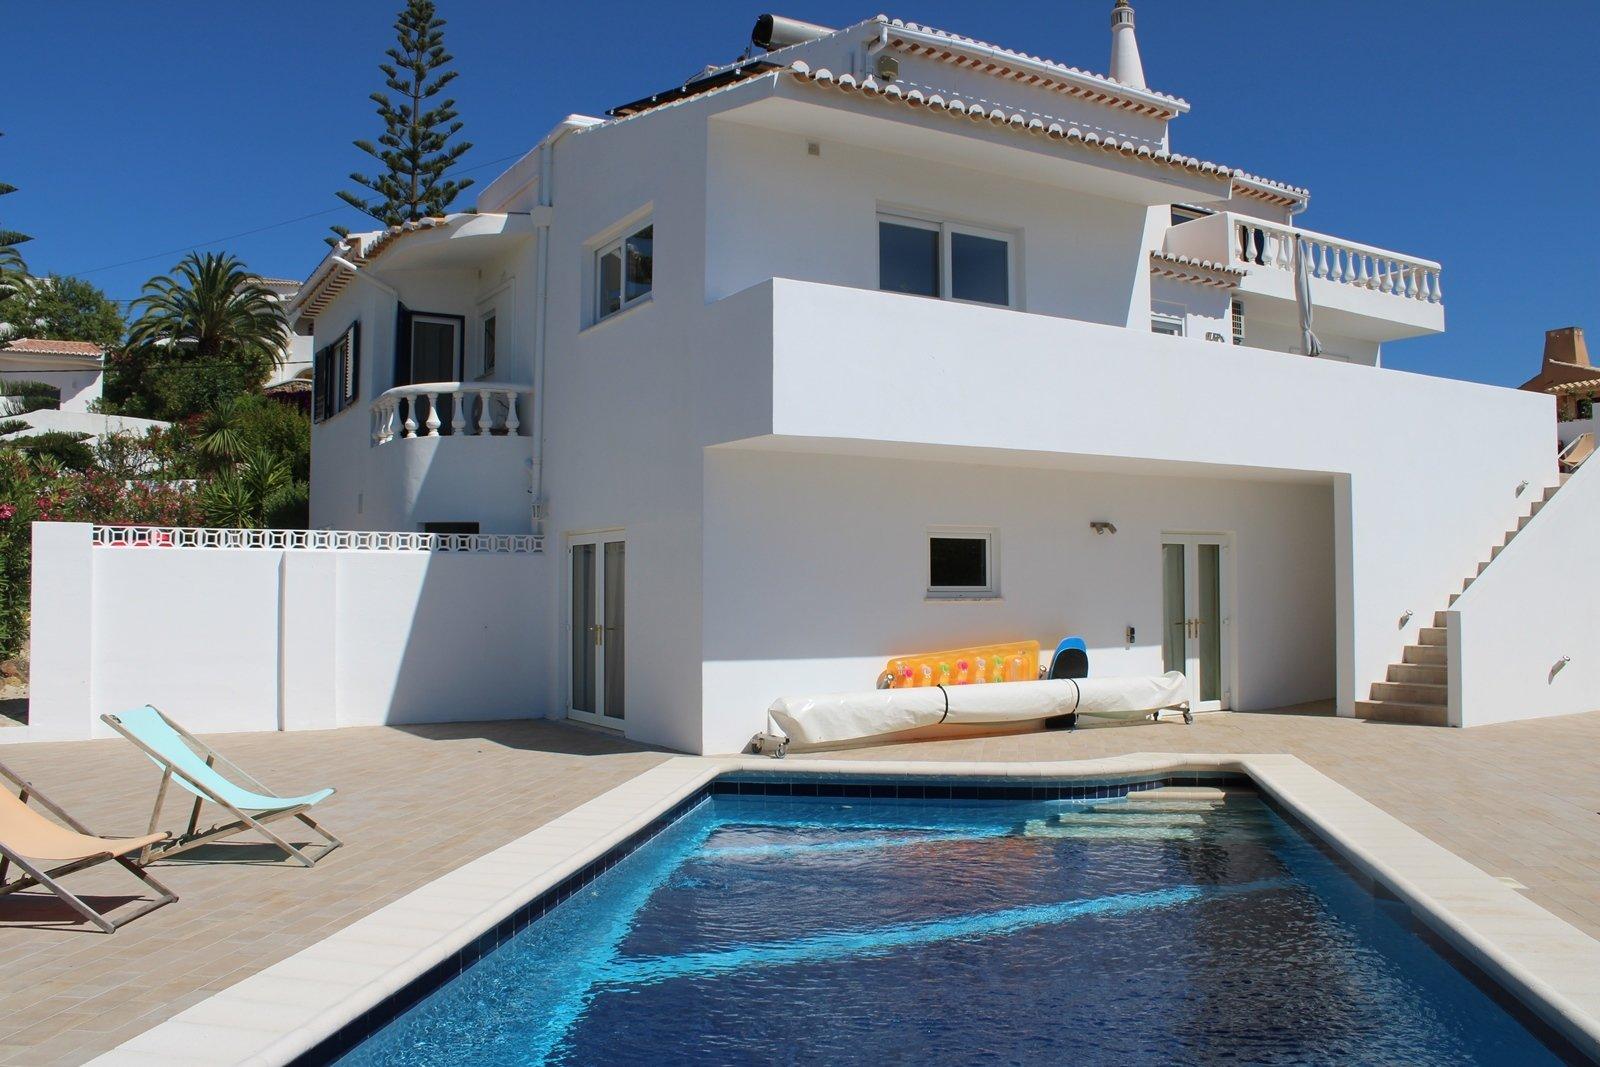 4 Bedroom Villa Praia da Luz, Western Algarve Ref: GV599